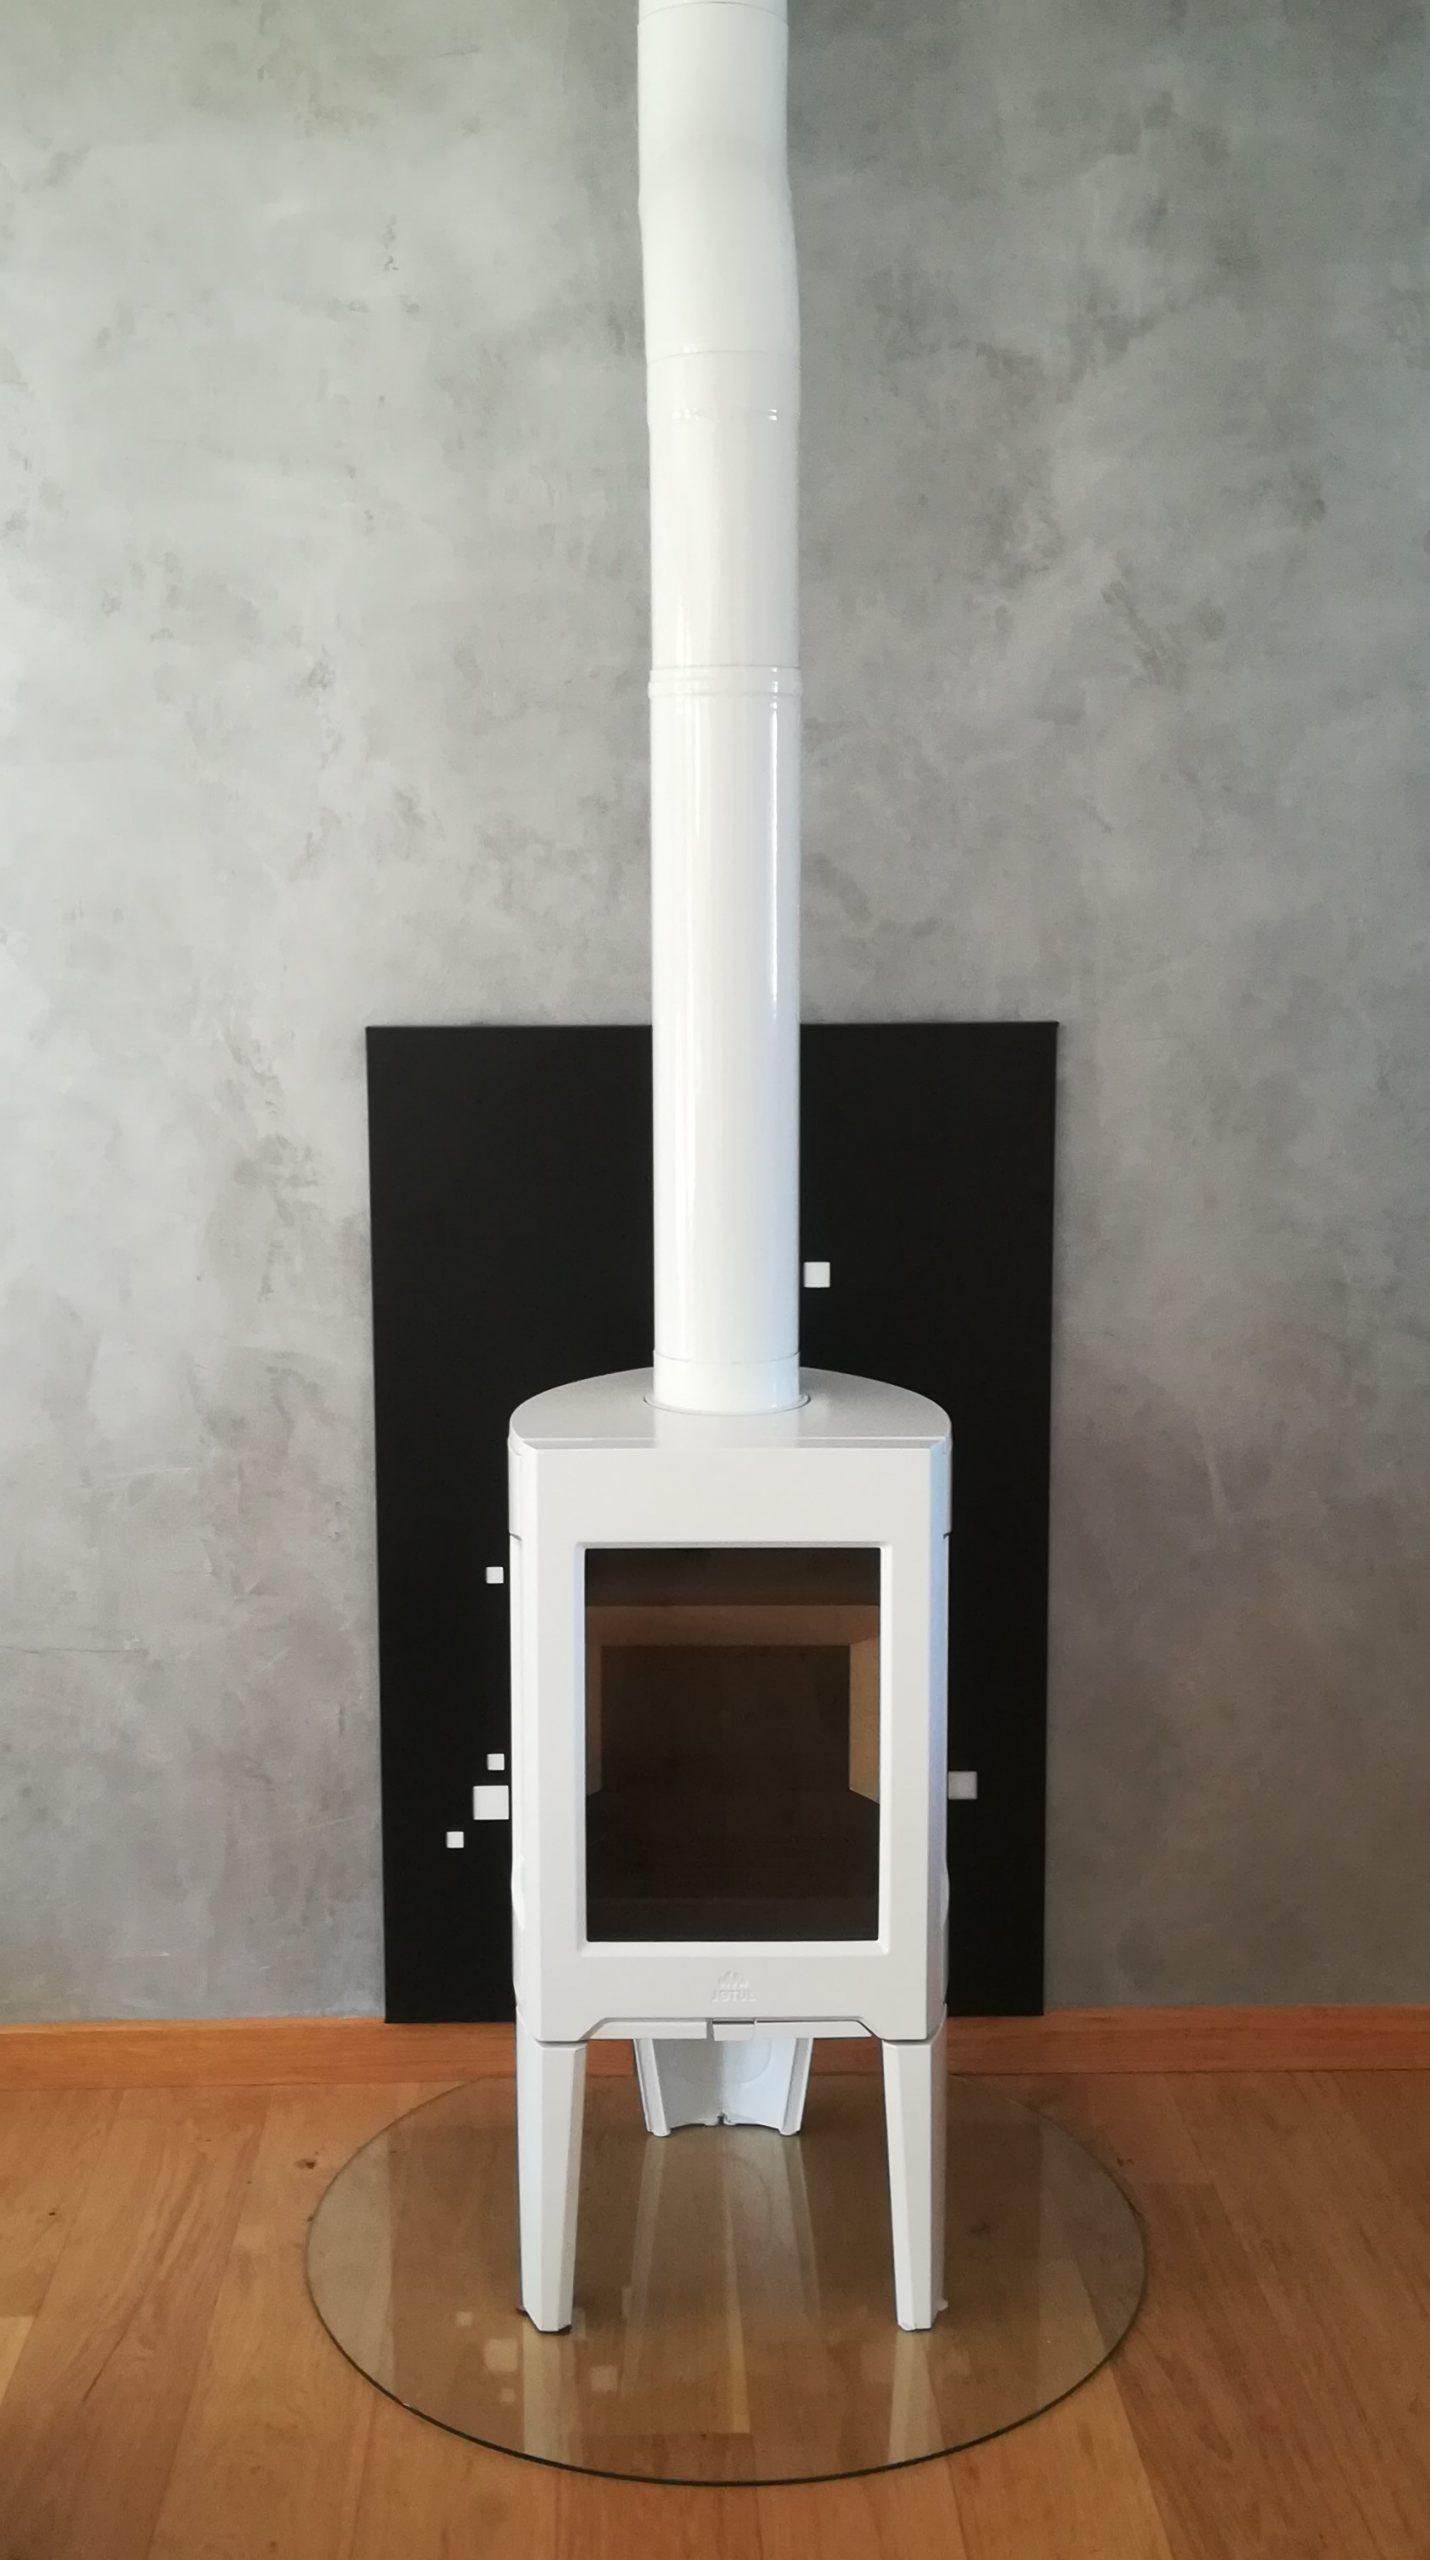 Poêle à bois 2 scaled - Galerie Chauffage / Plomberie